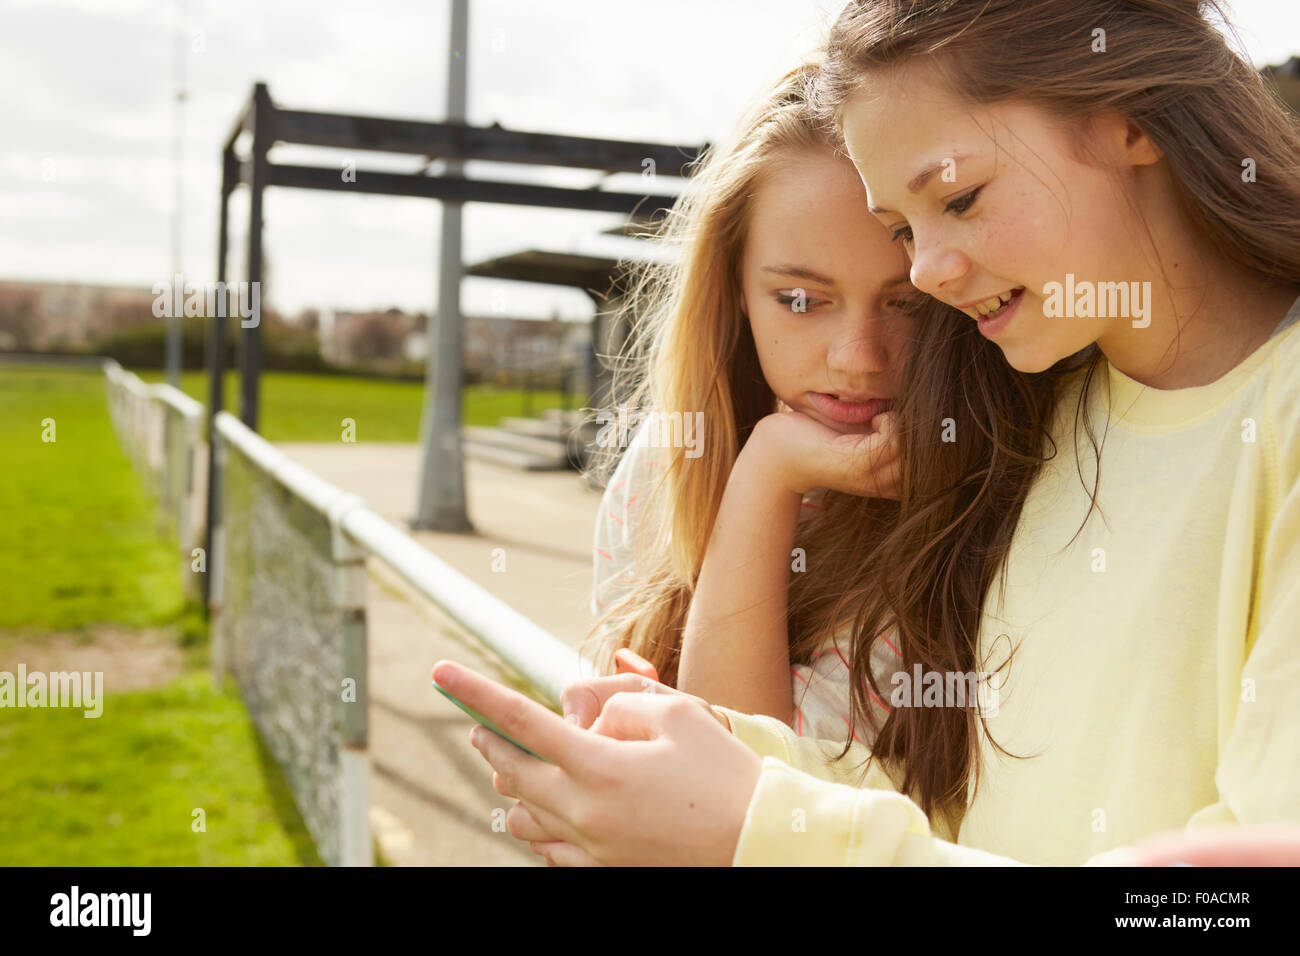 Dos niñas leer mensajes de texto smartphone Imagen De Stock